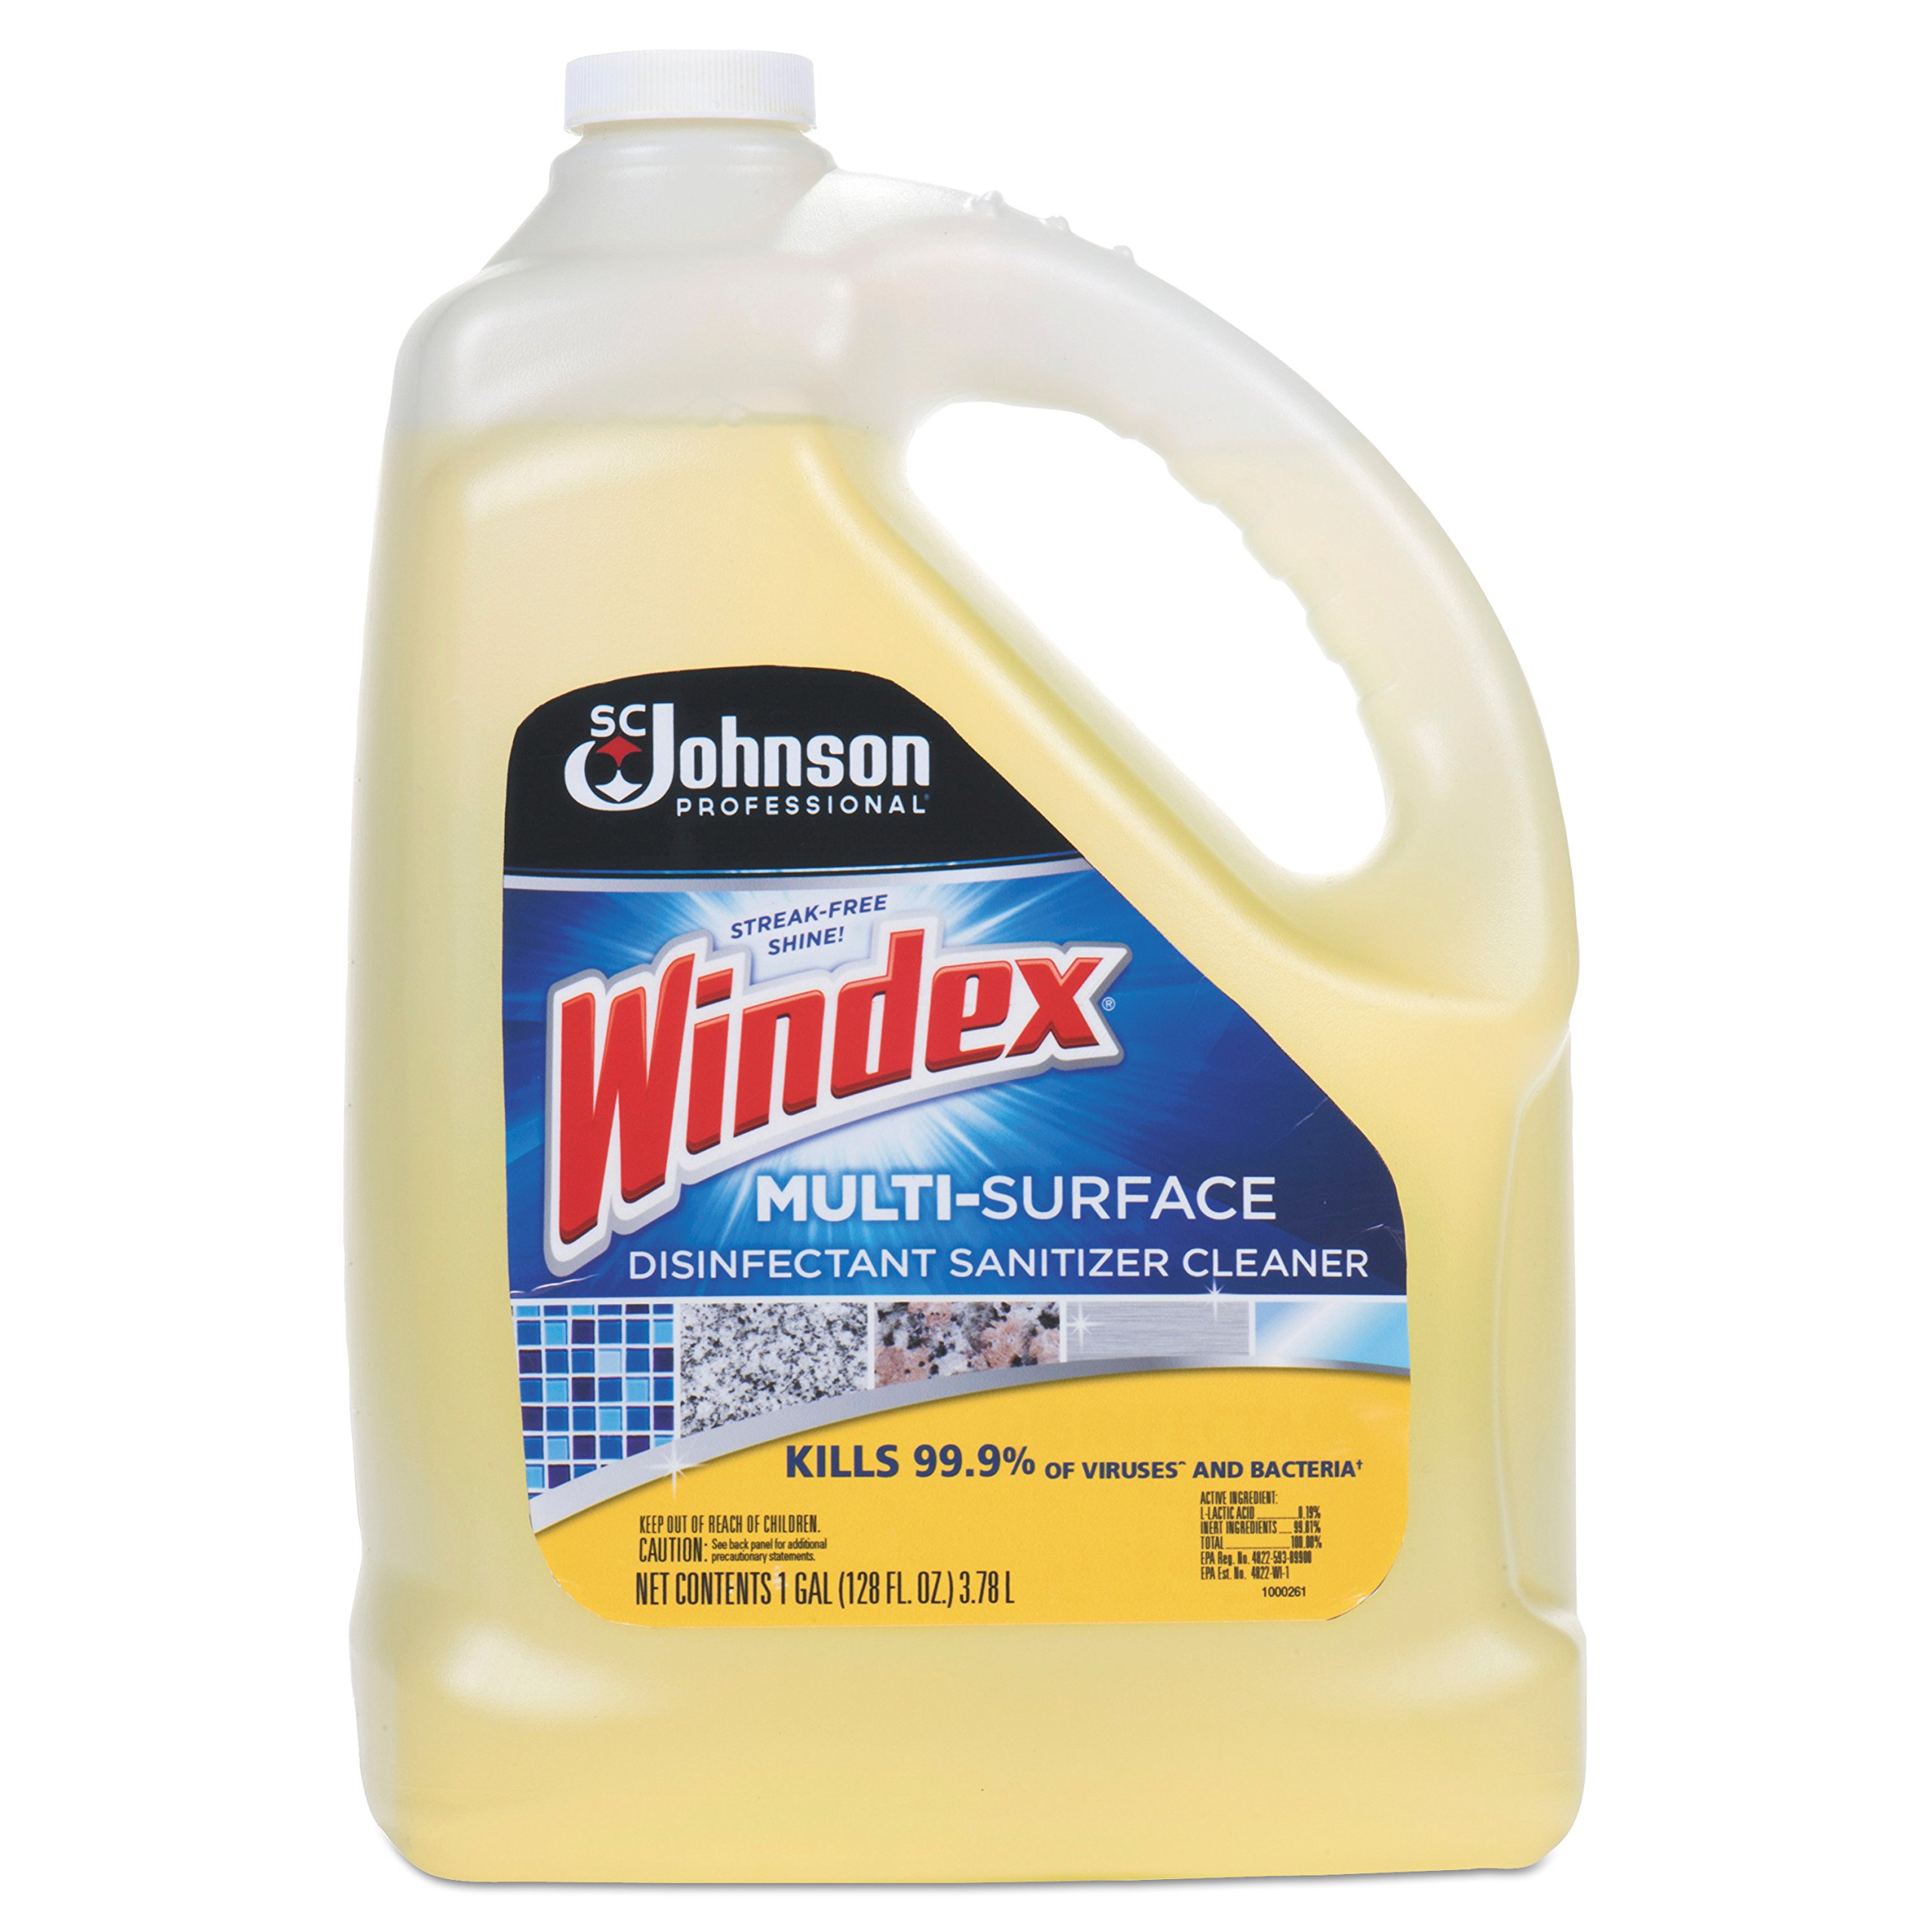 Windex 657067 T Multi-Surface Disinfectant Cleaner, Citrus, 1 gal Bottle (Case of 4)